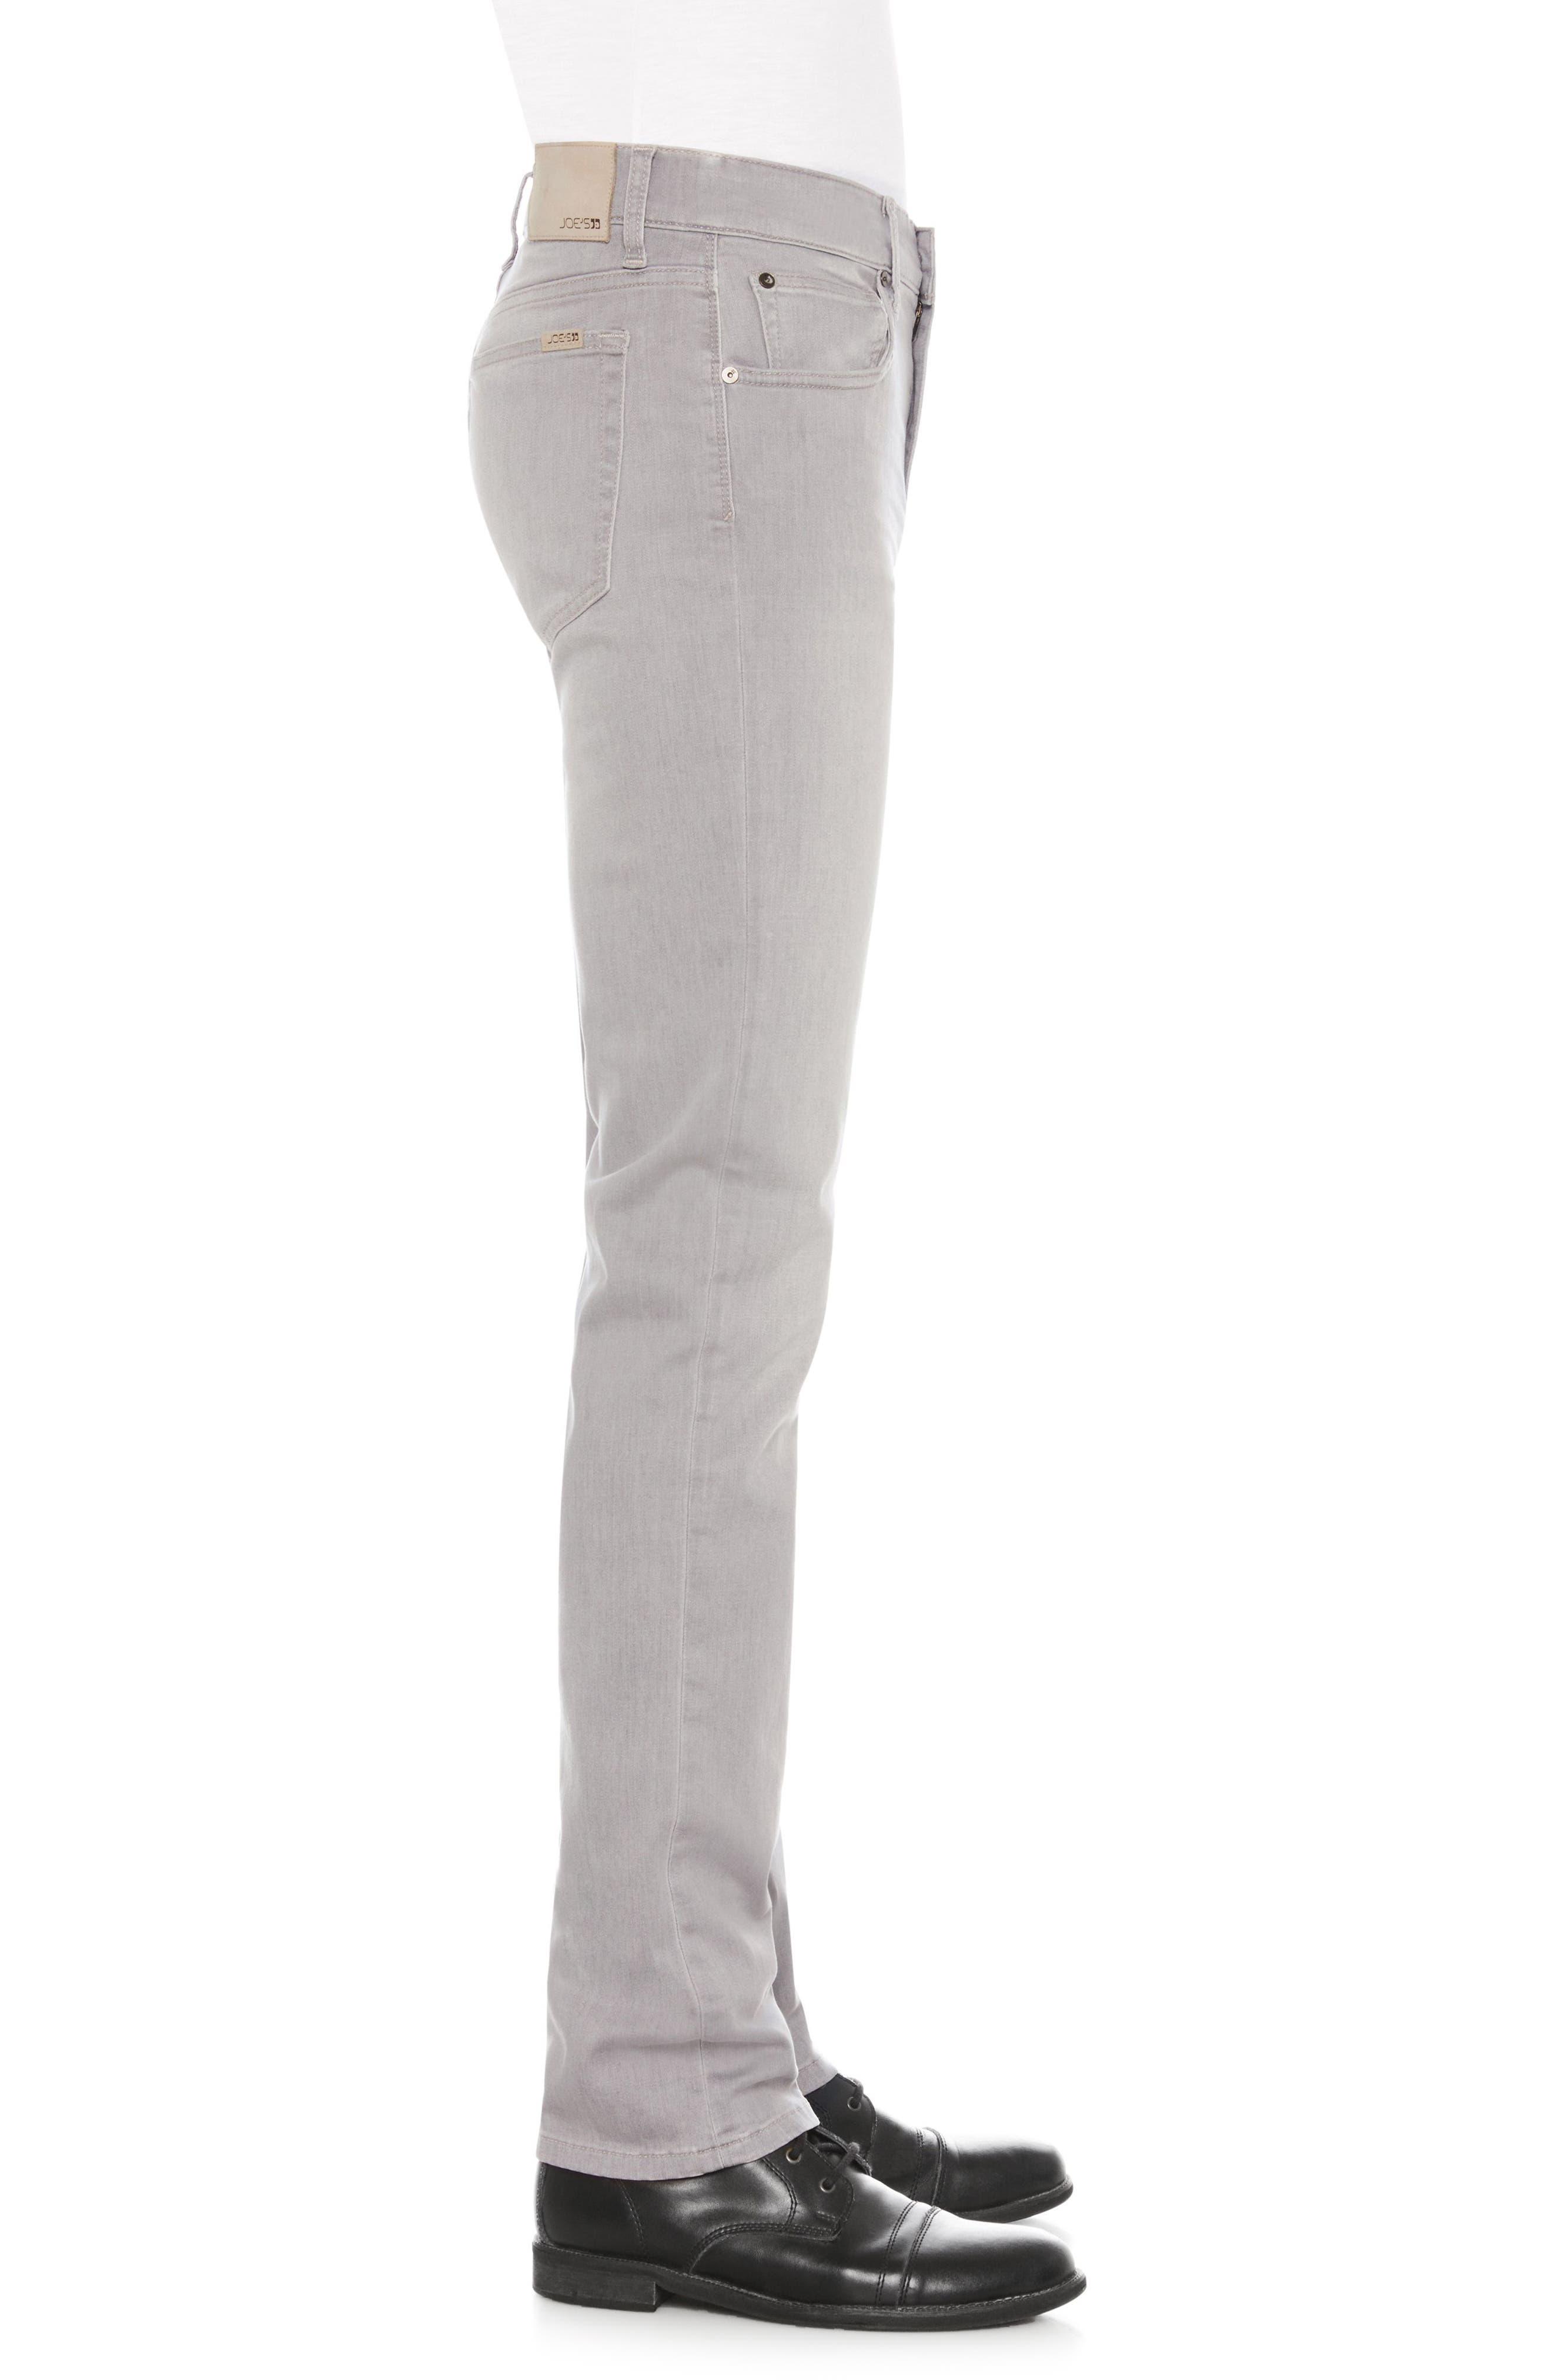 Brixton Slim Straight Fit Jeans,                             Alternate thumbnail 3, color,                             Steve